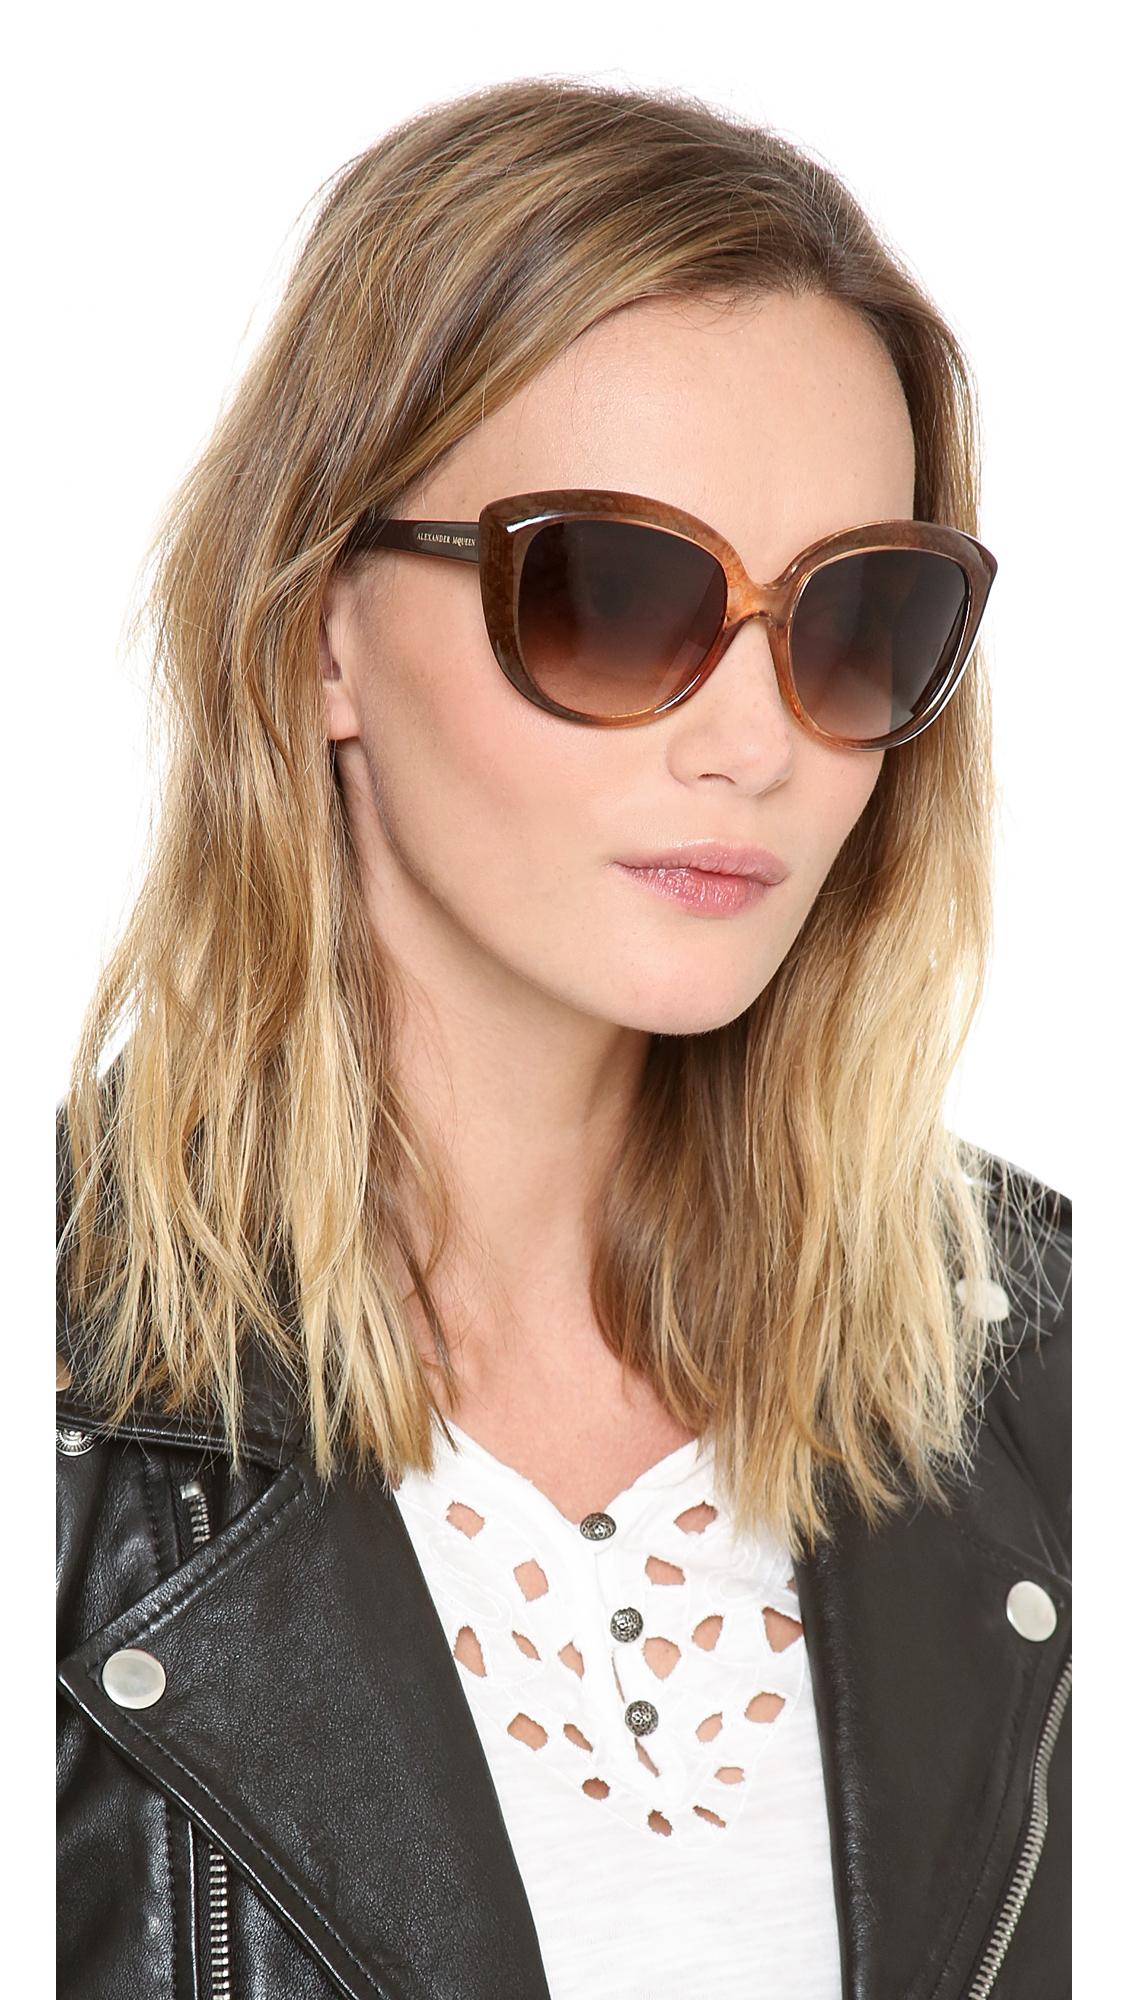 Alexander Mcqueen Cateye Sunglasses  alexander mcqueen cat eye sunglasses in brown lyst